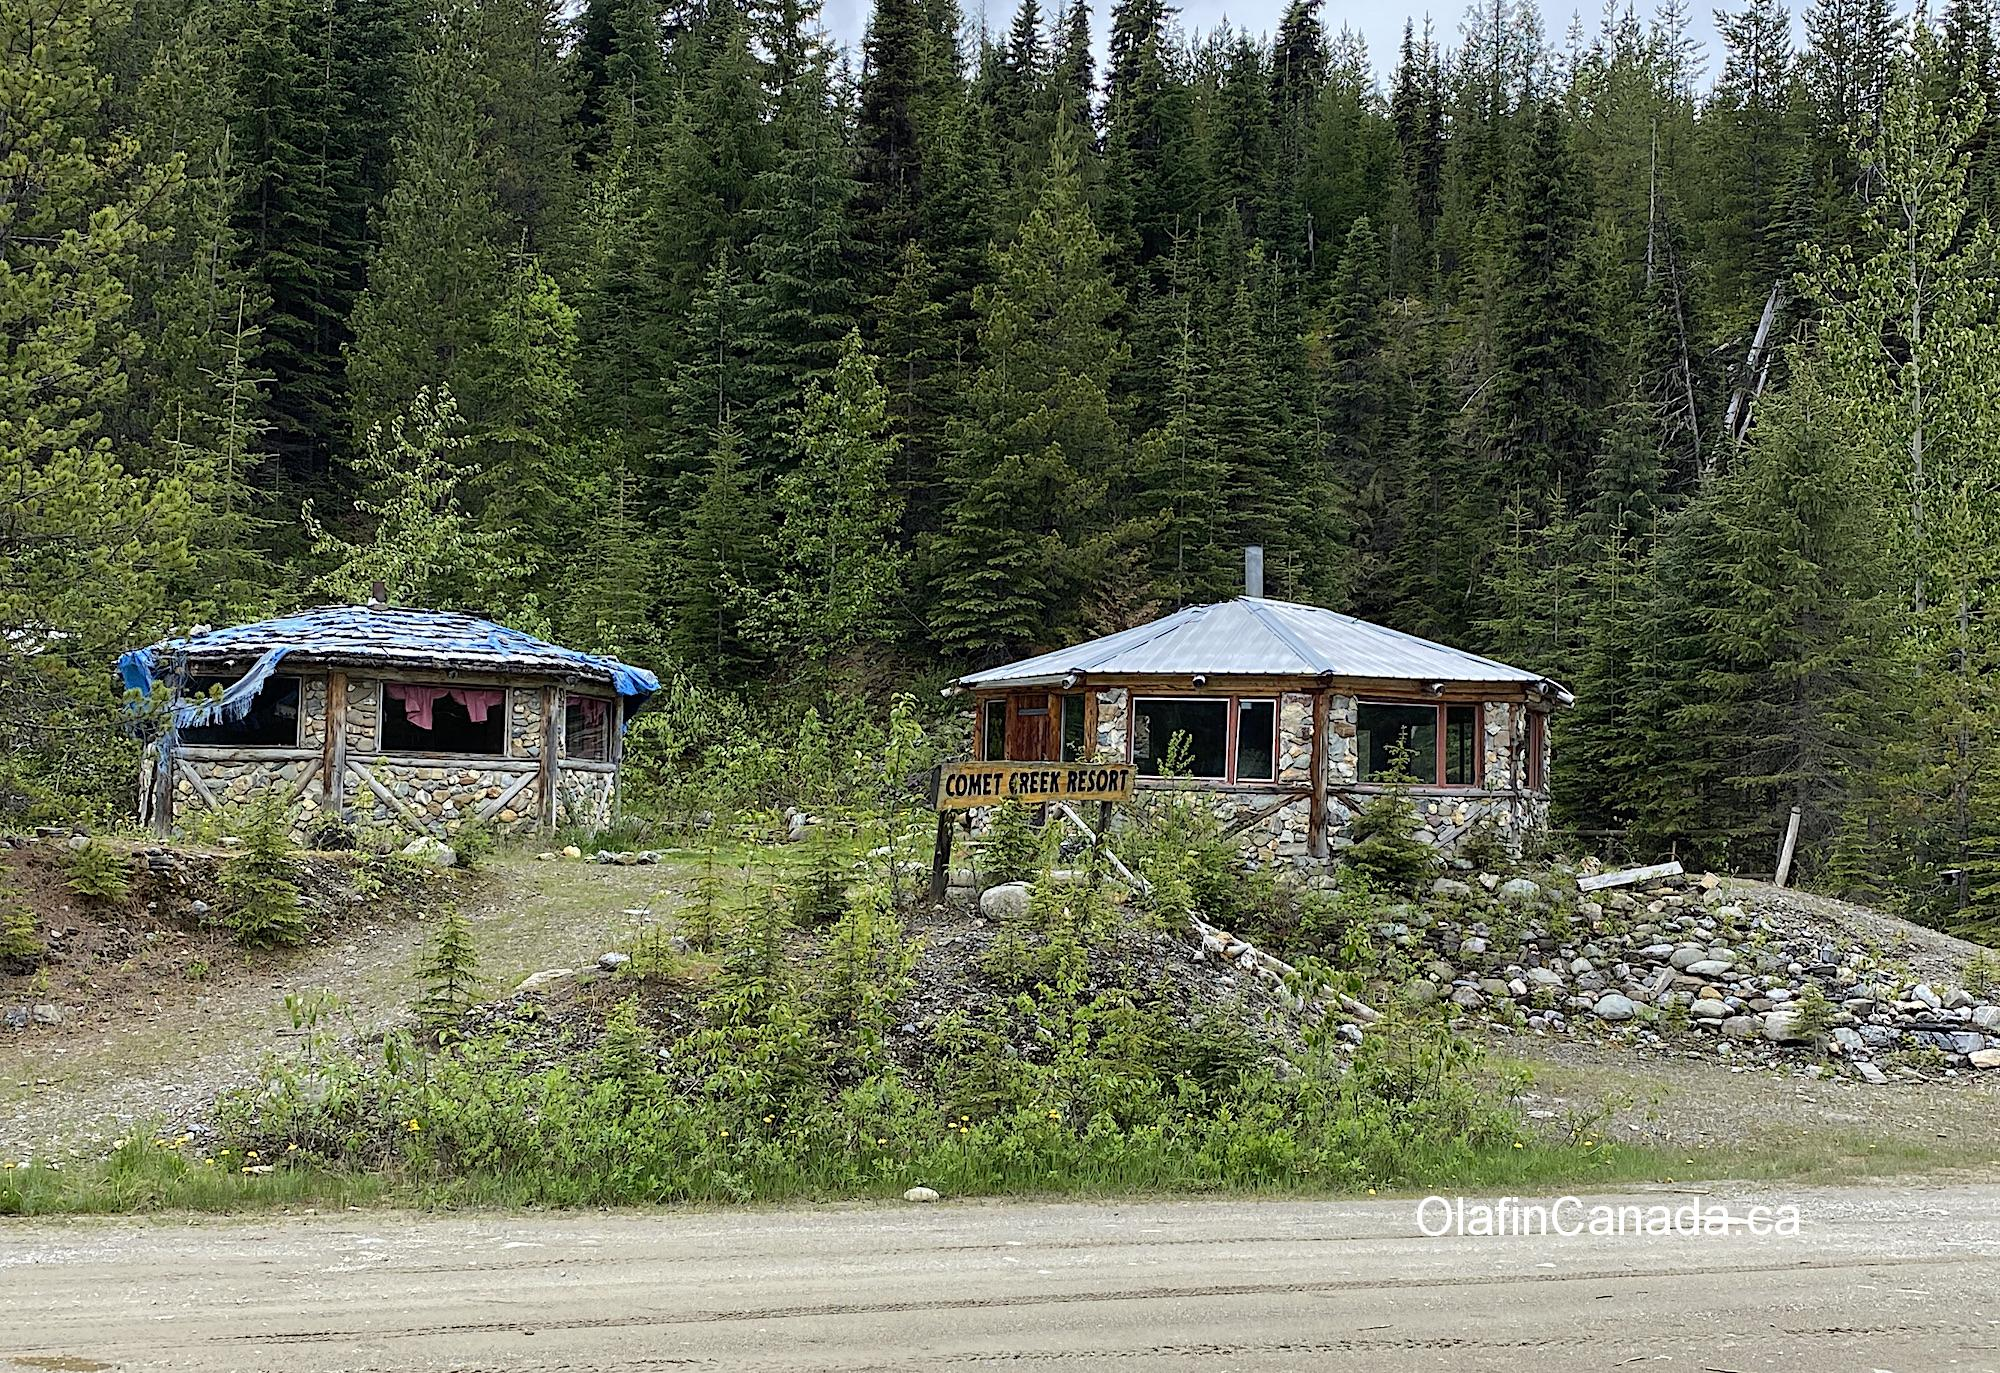 Abandoned Comet Creek Resort in the Cariboo between Likely and Barkerville  #olafincanada #britishcolumbia #discoverbc #abandonedbc #cariboo #cometcreekresort